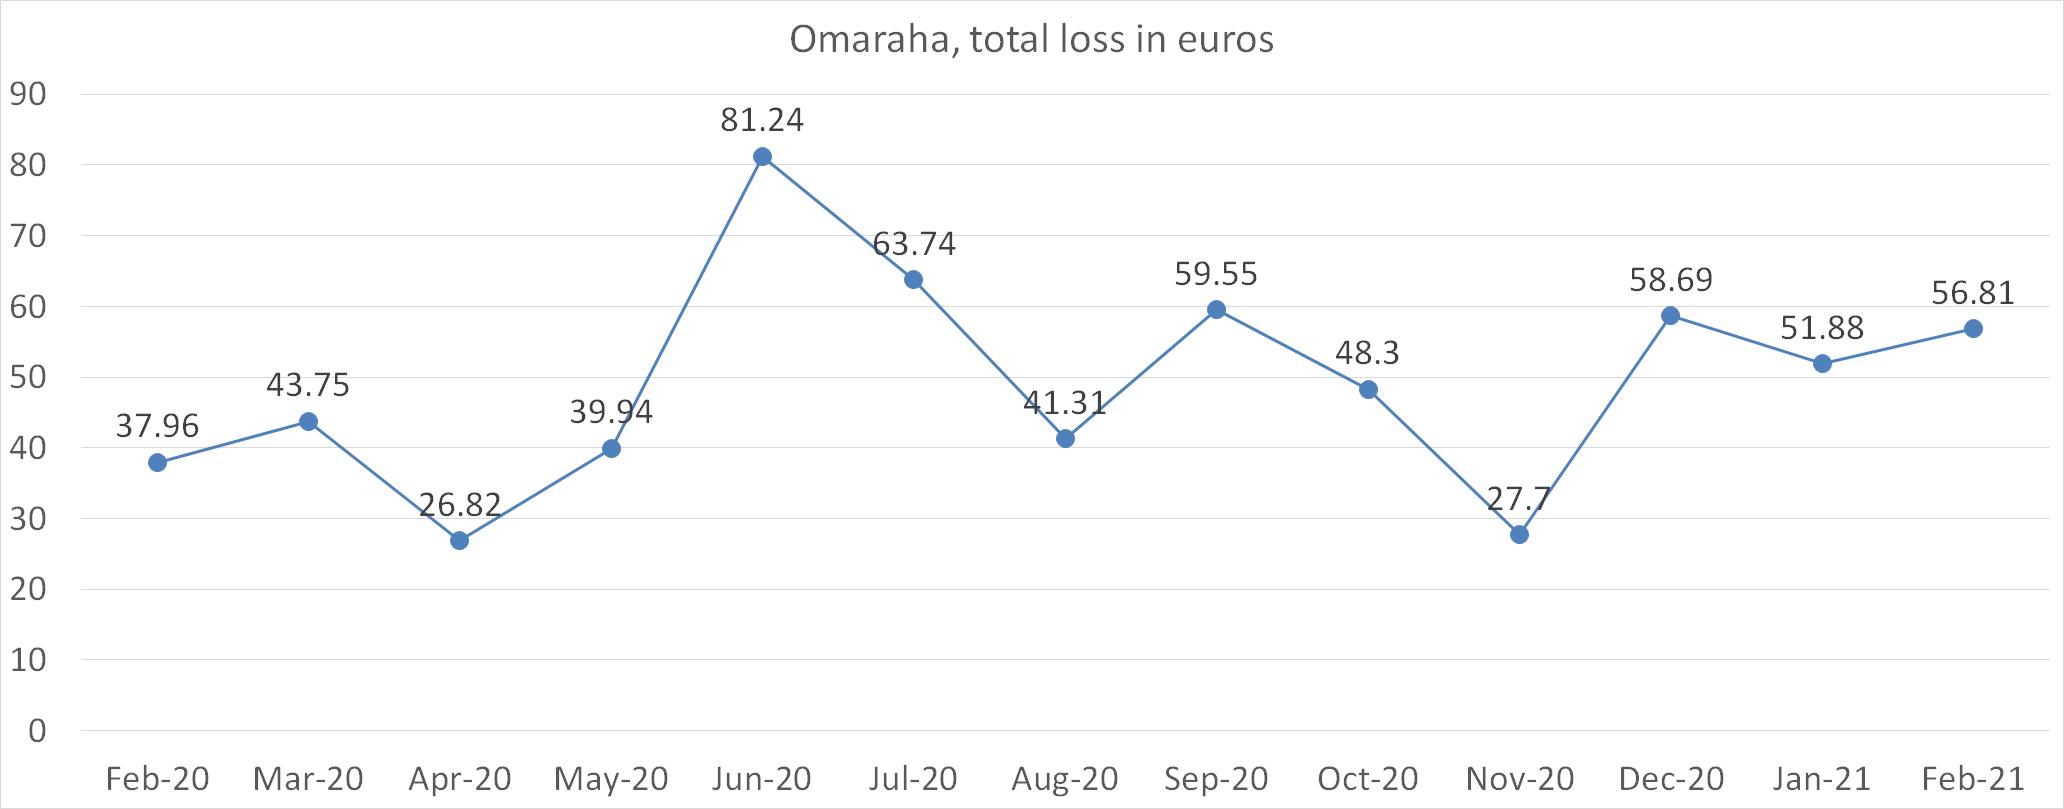 Omaraha, total loss in euros february 2021